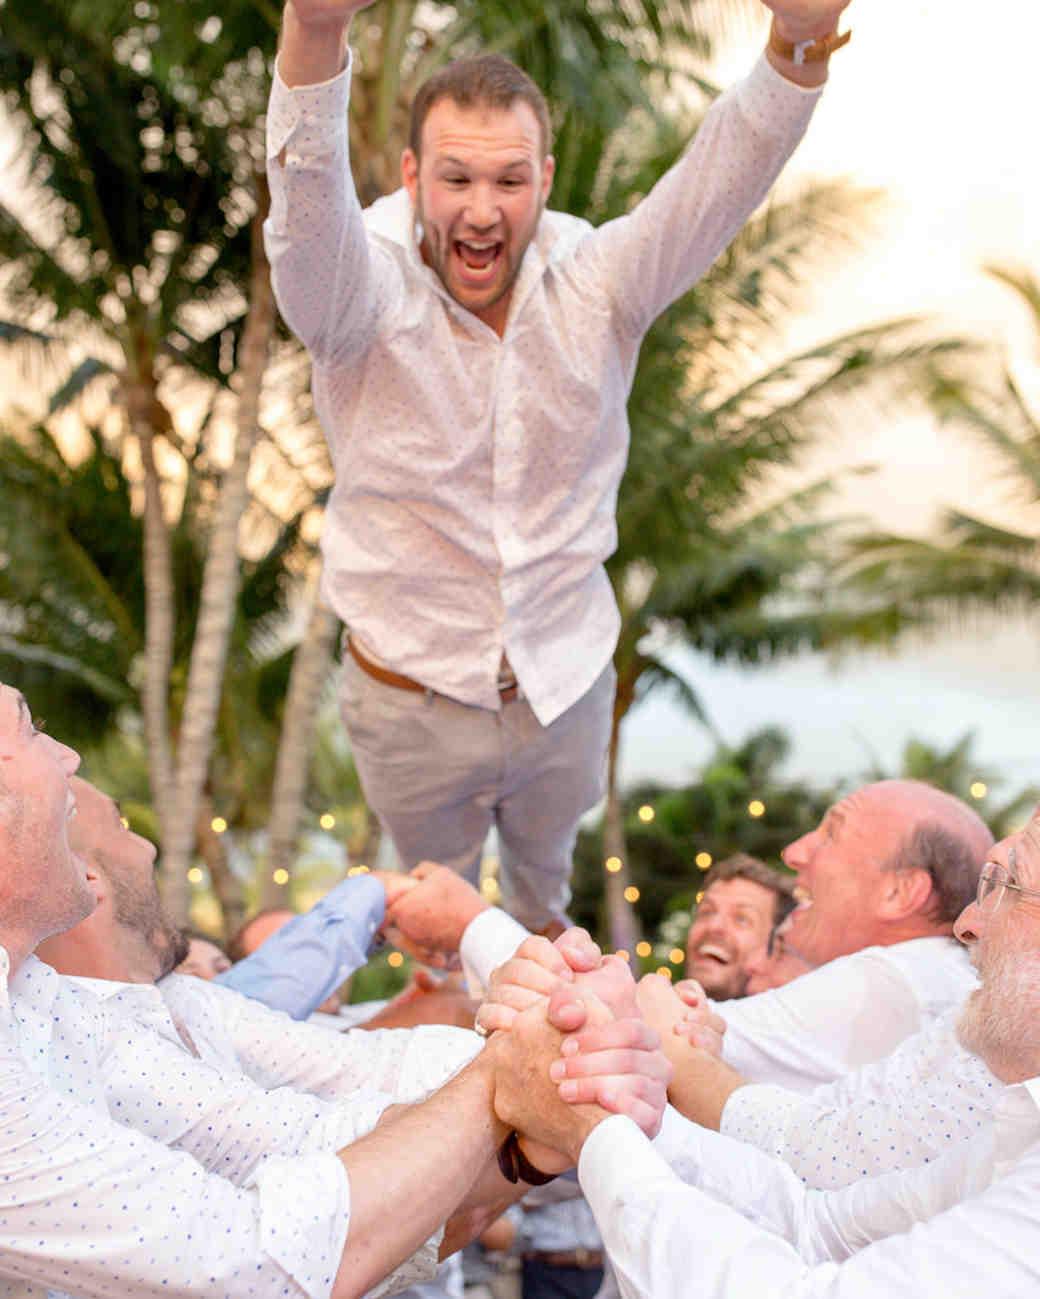 groom crowd surfs on groomsmen during reception